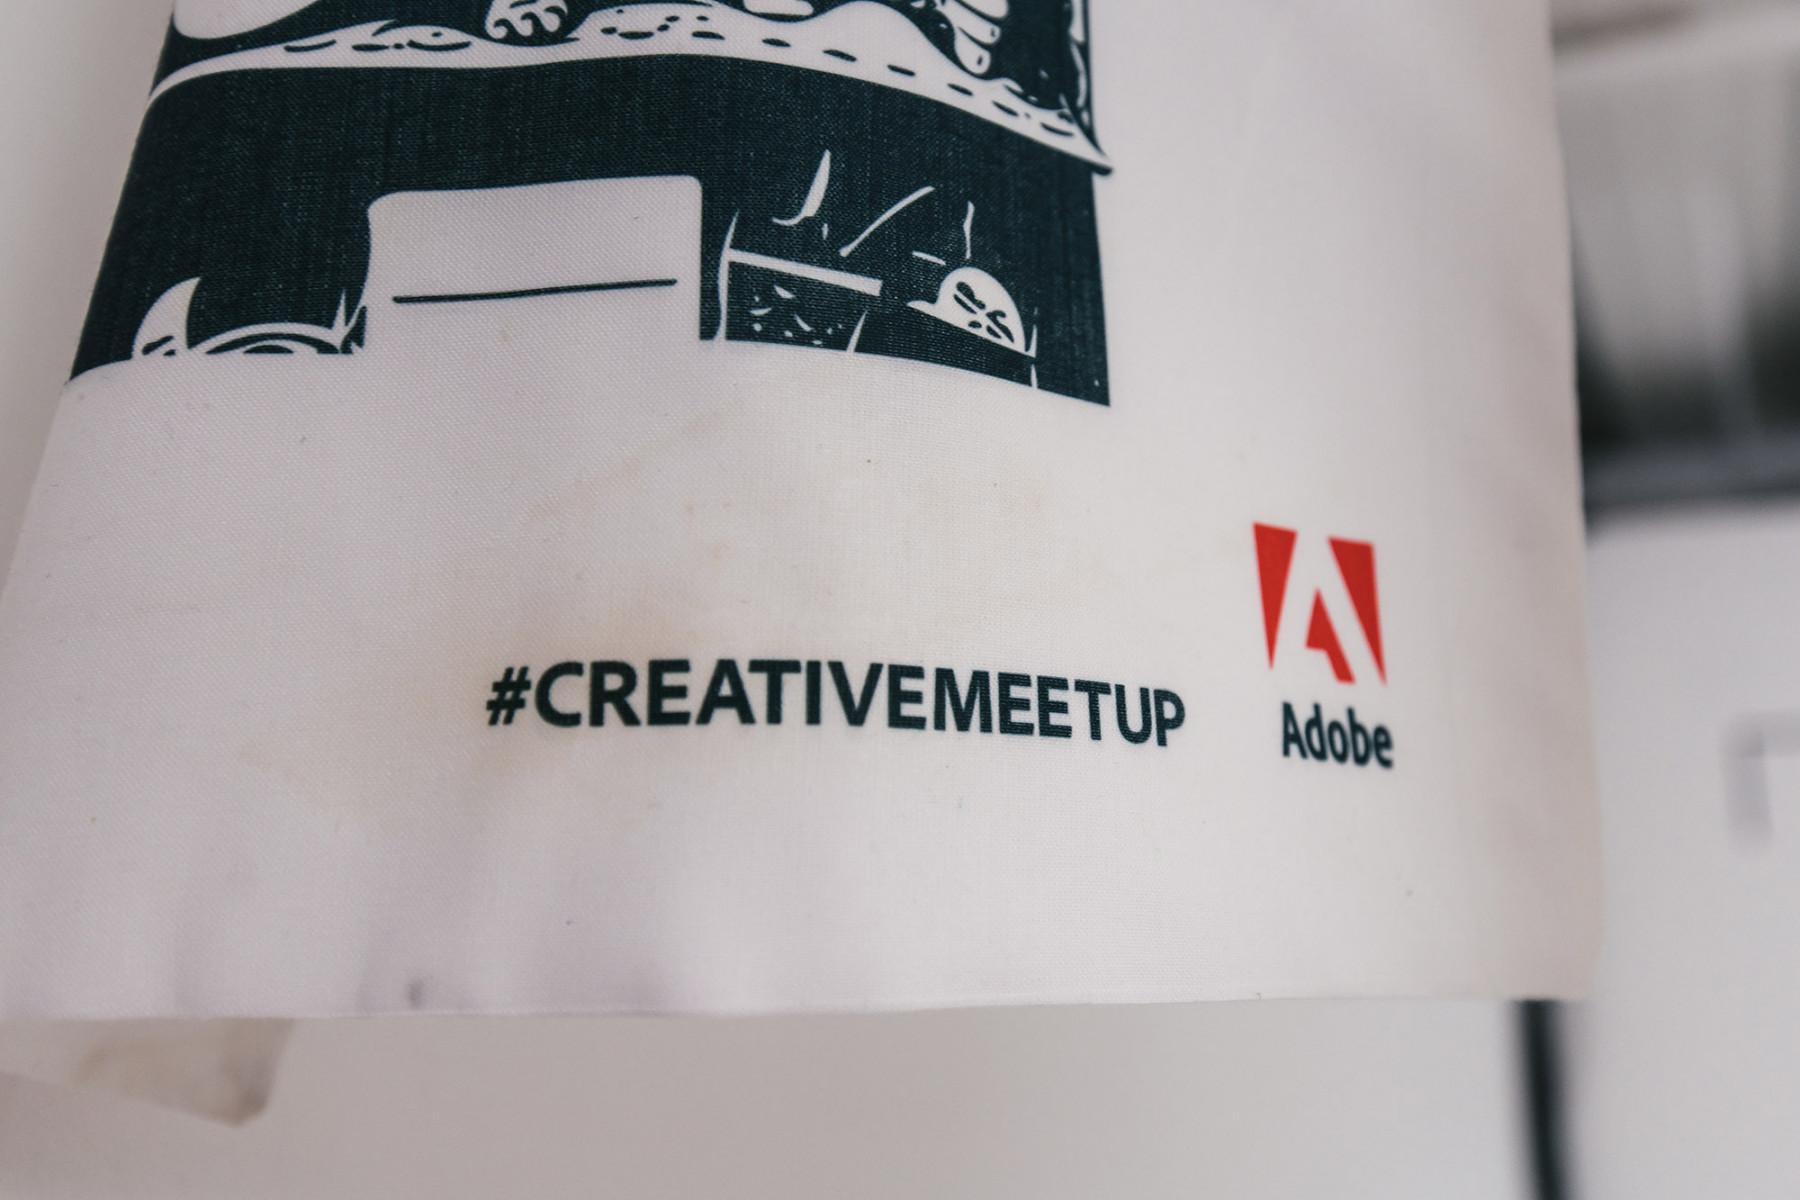 Adobe Creative Cloud Event Printed Bags